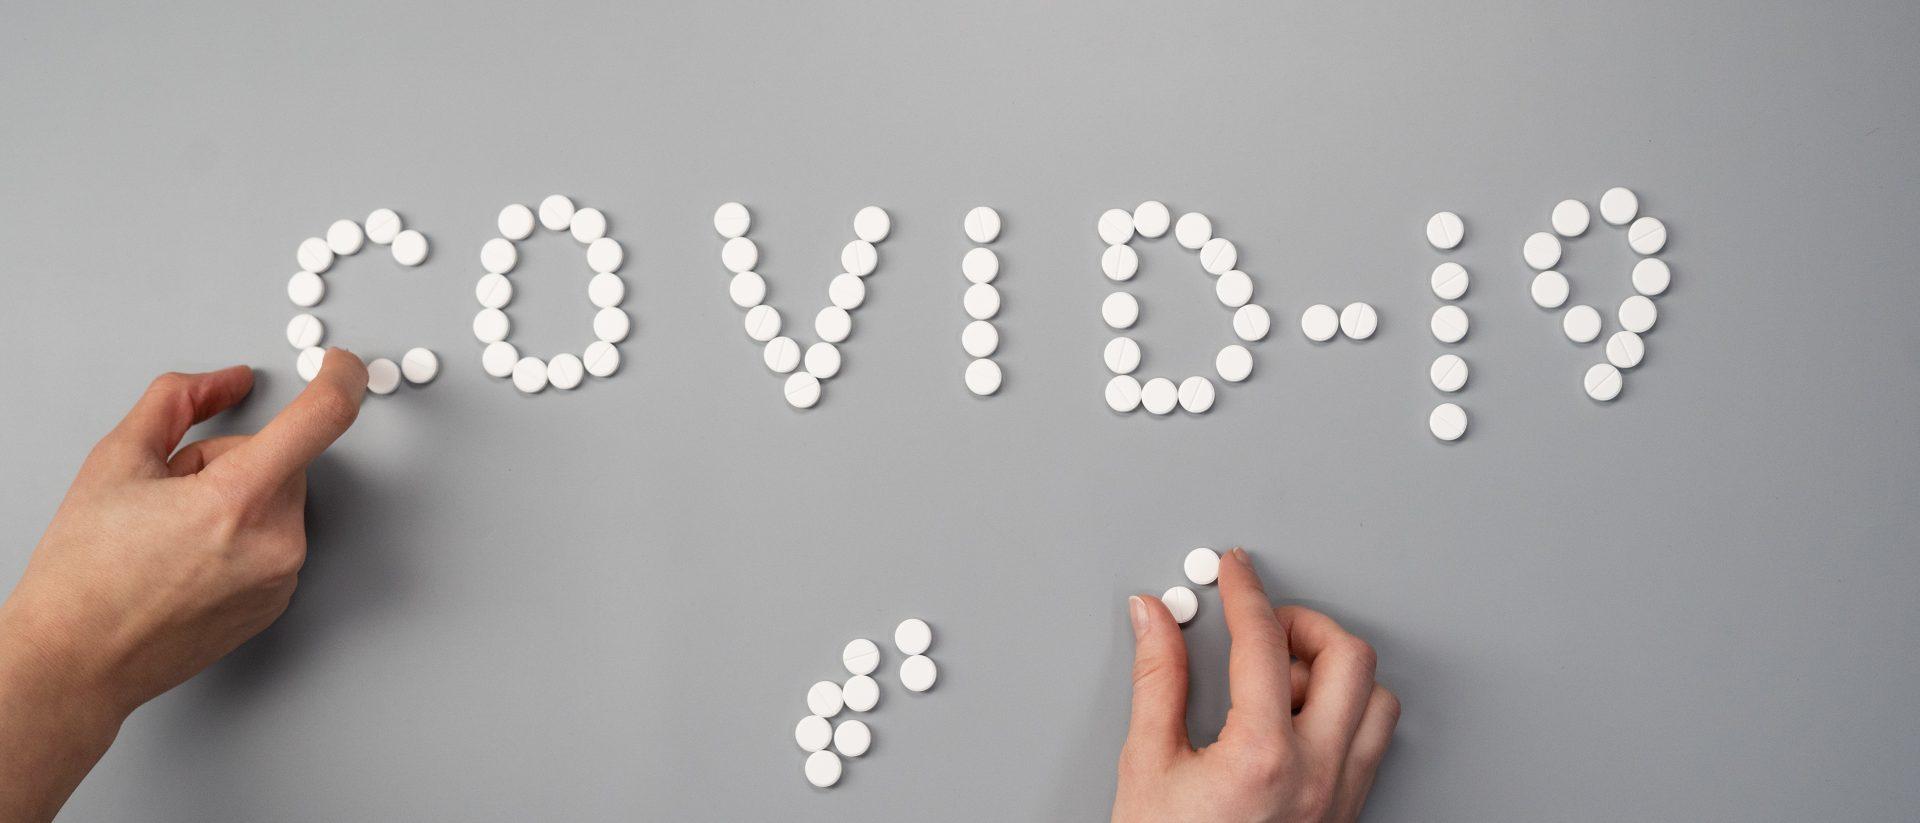 pills-on-gray-background-3923164